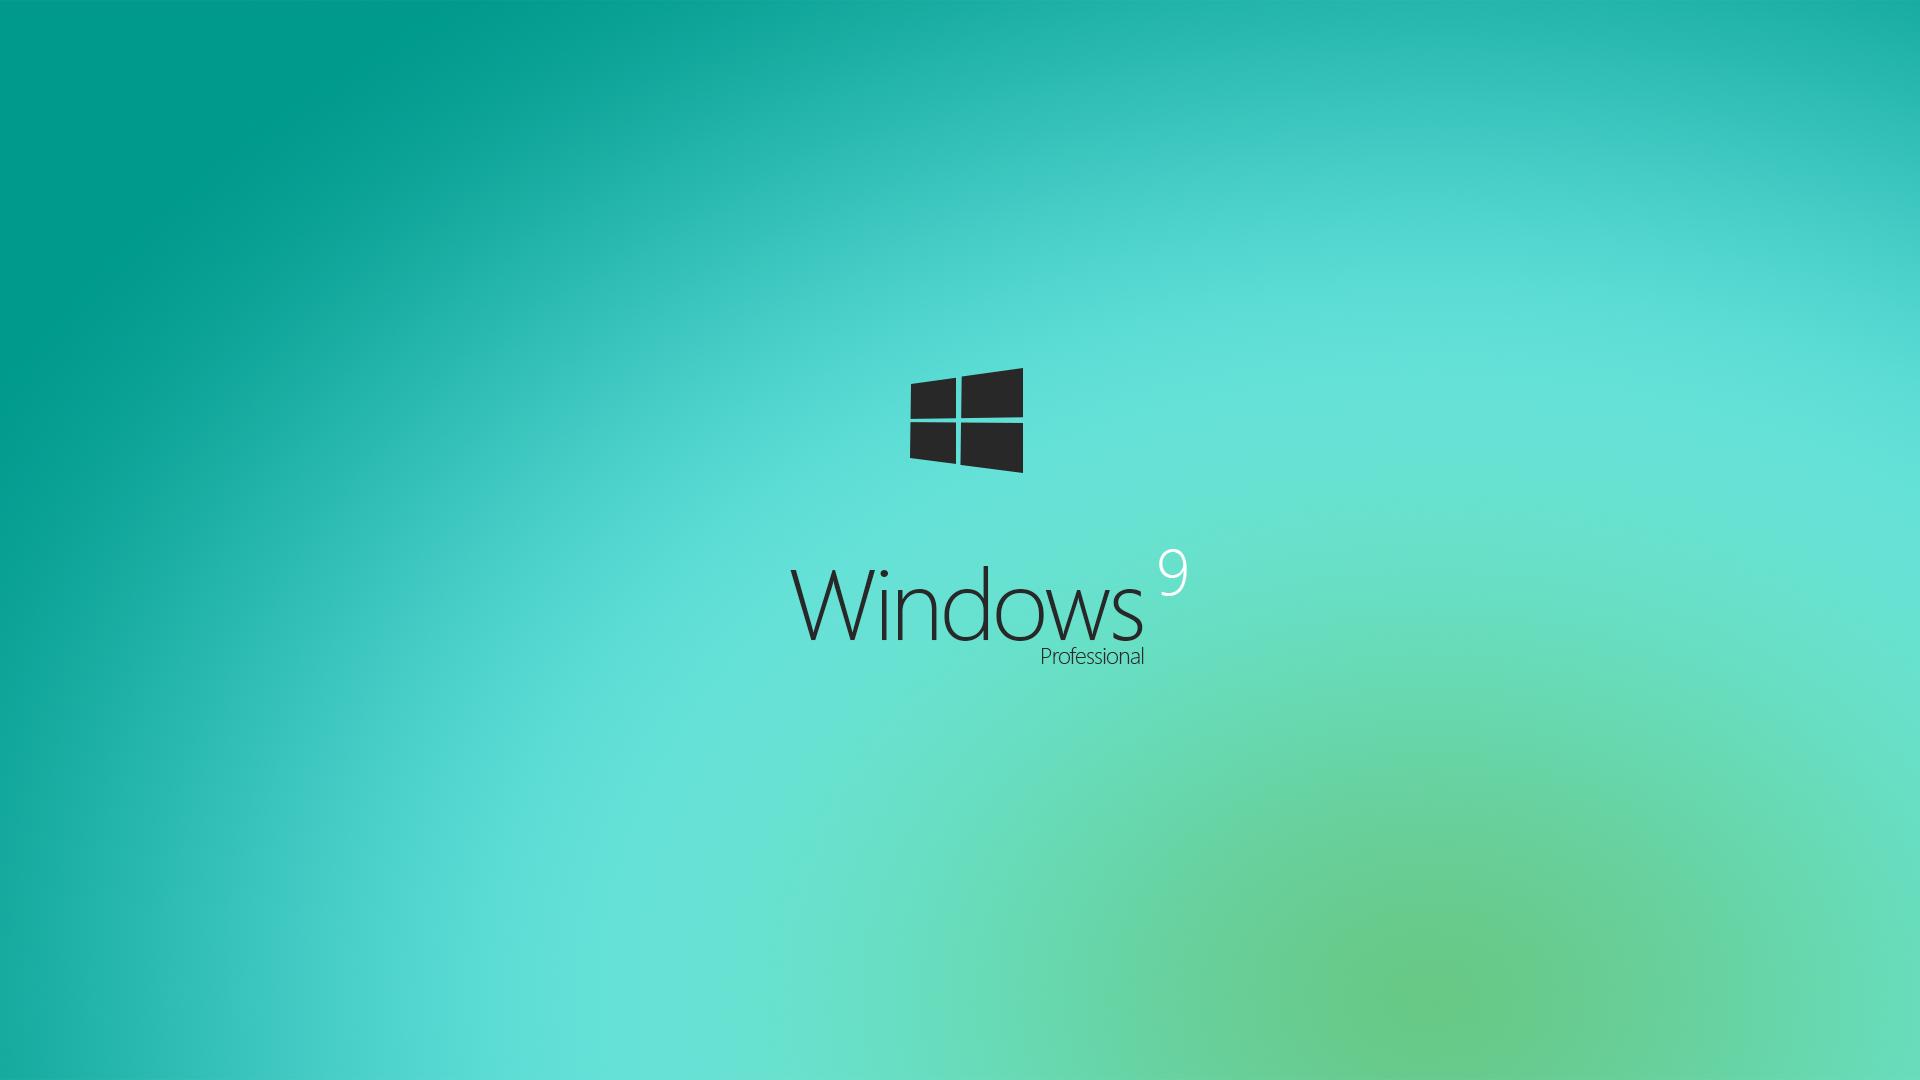 Windows 9 Wallpaper Hd Concept By Danielskrzypon On Deviantart